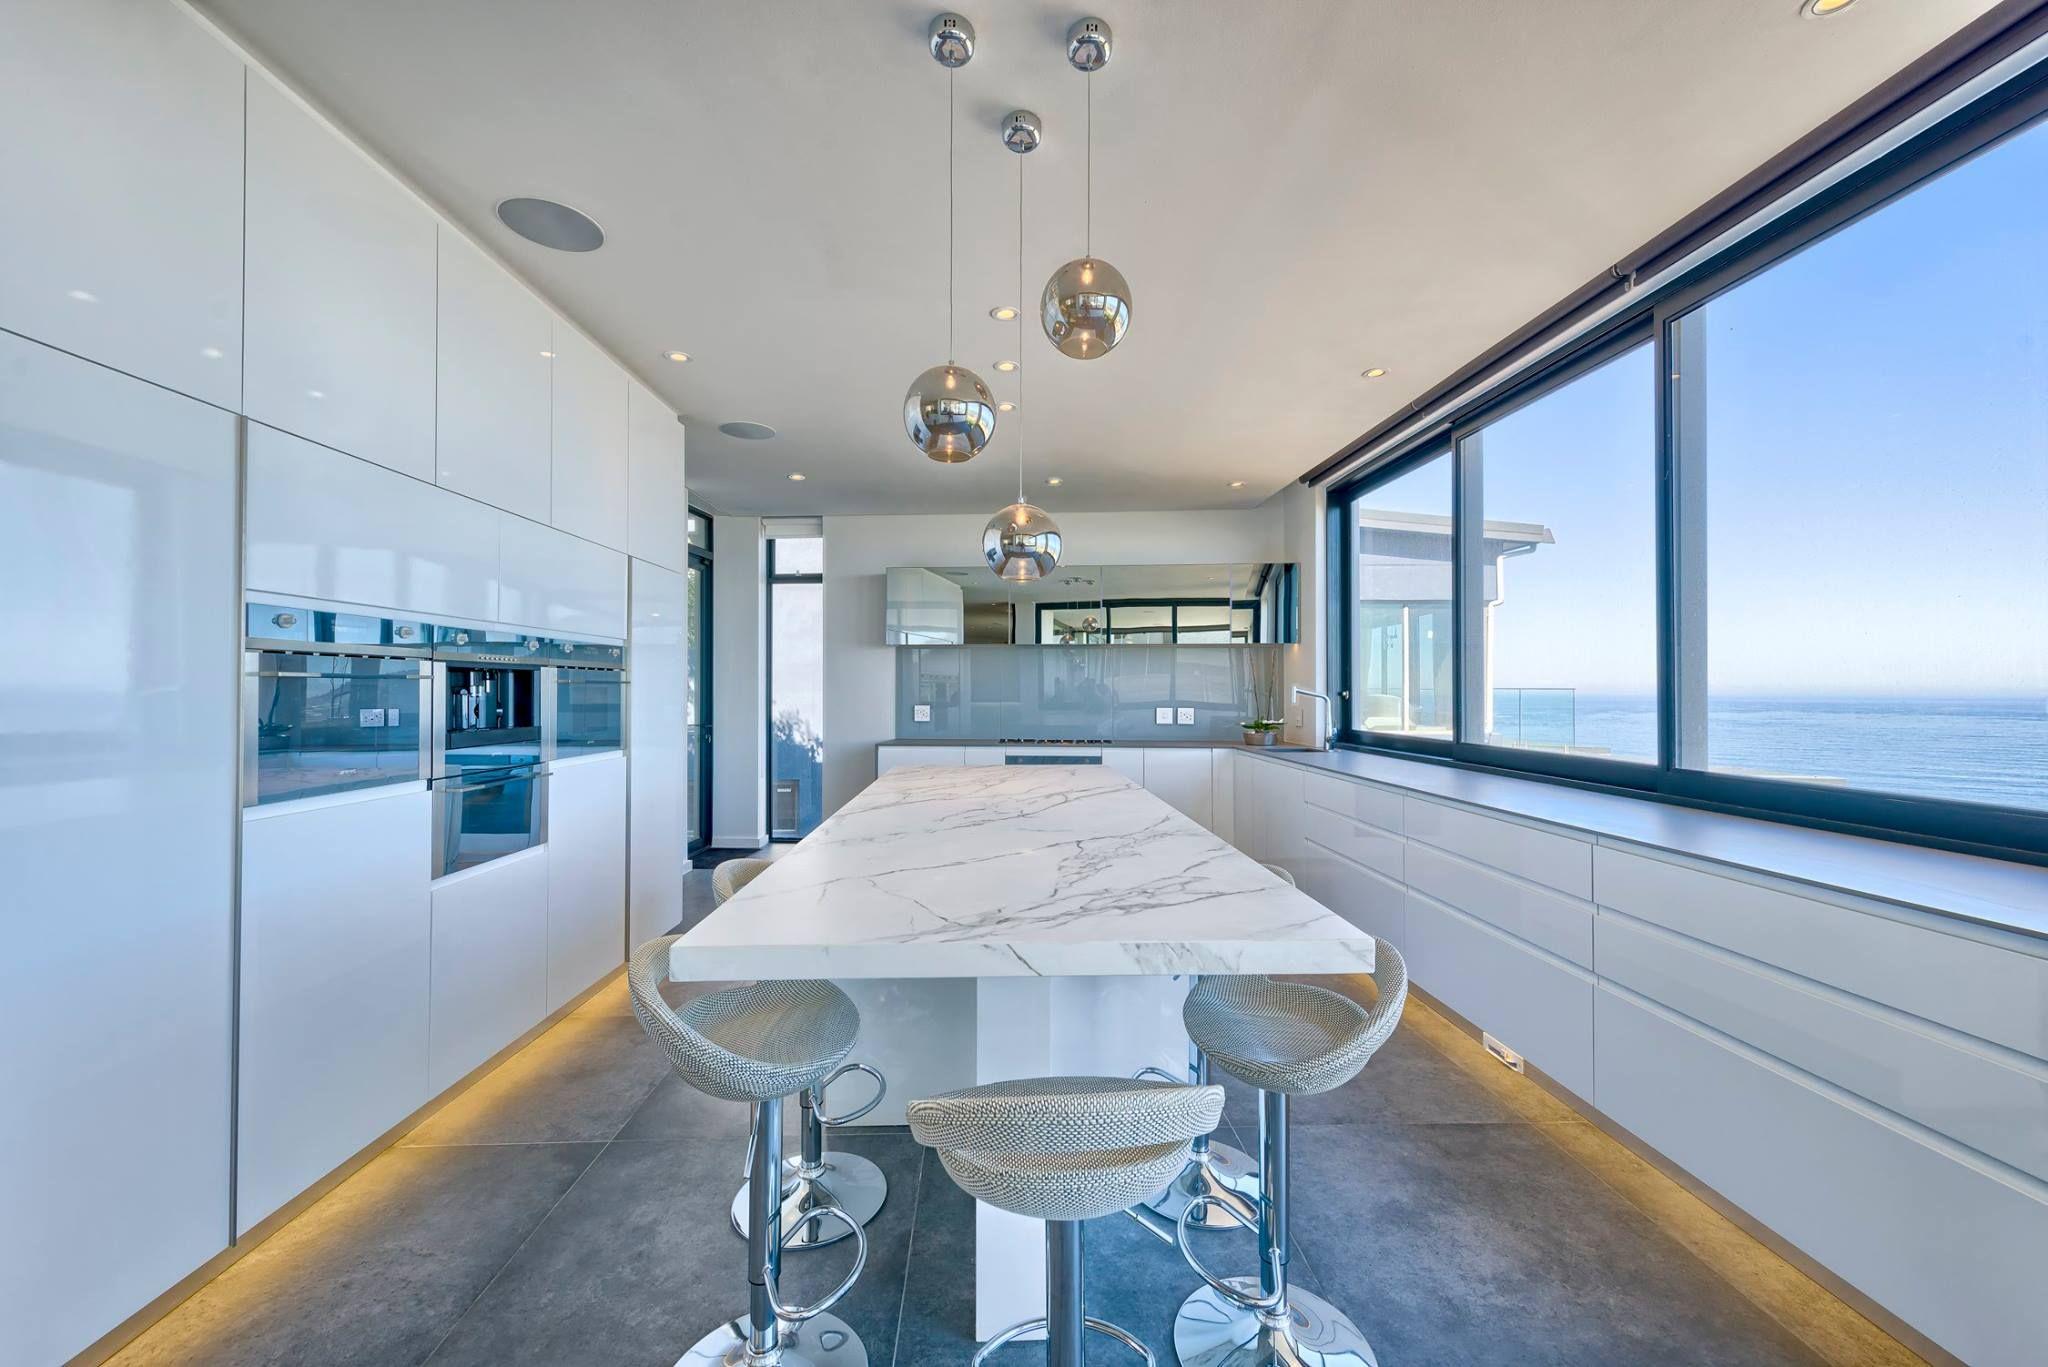 Worktop   Ionia Pietre Naturali   Stone Kitchen Worktop Design ...